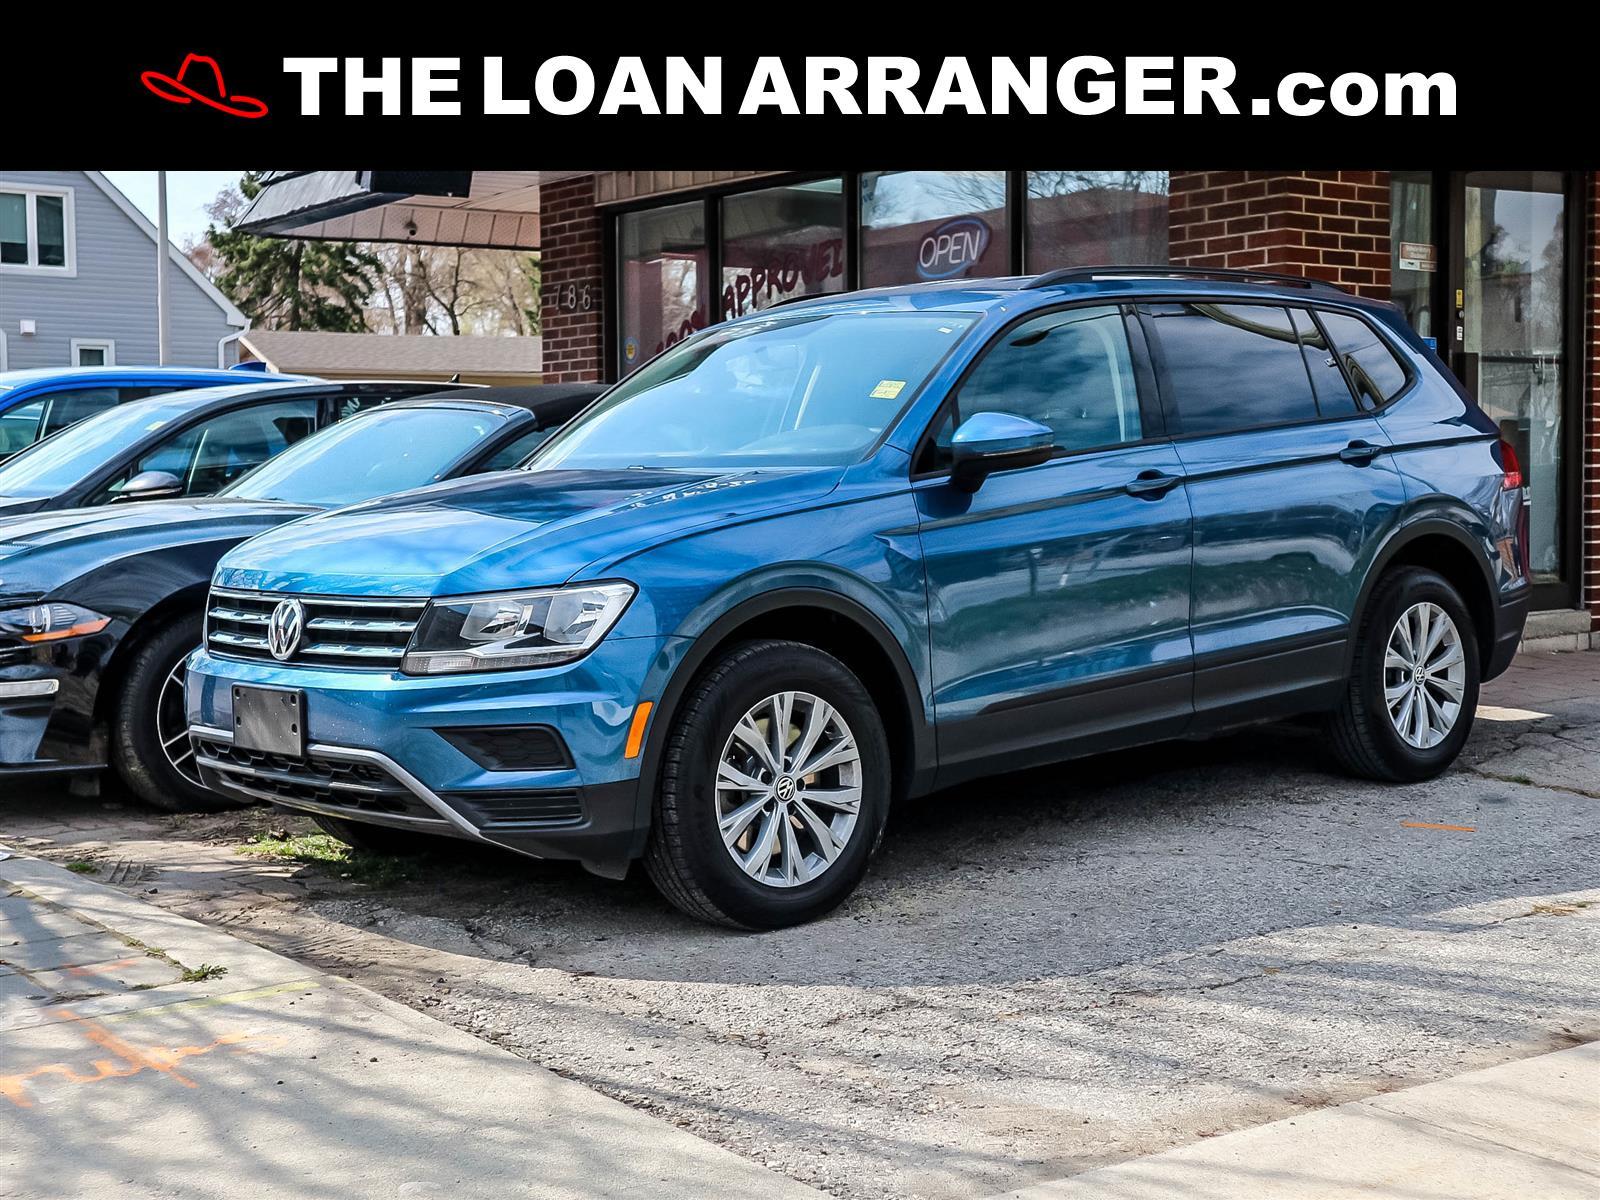 used 2019 Volkswagen Tiguan car